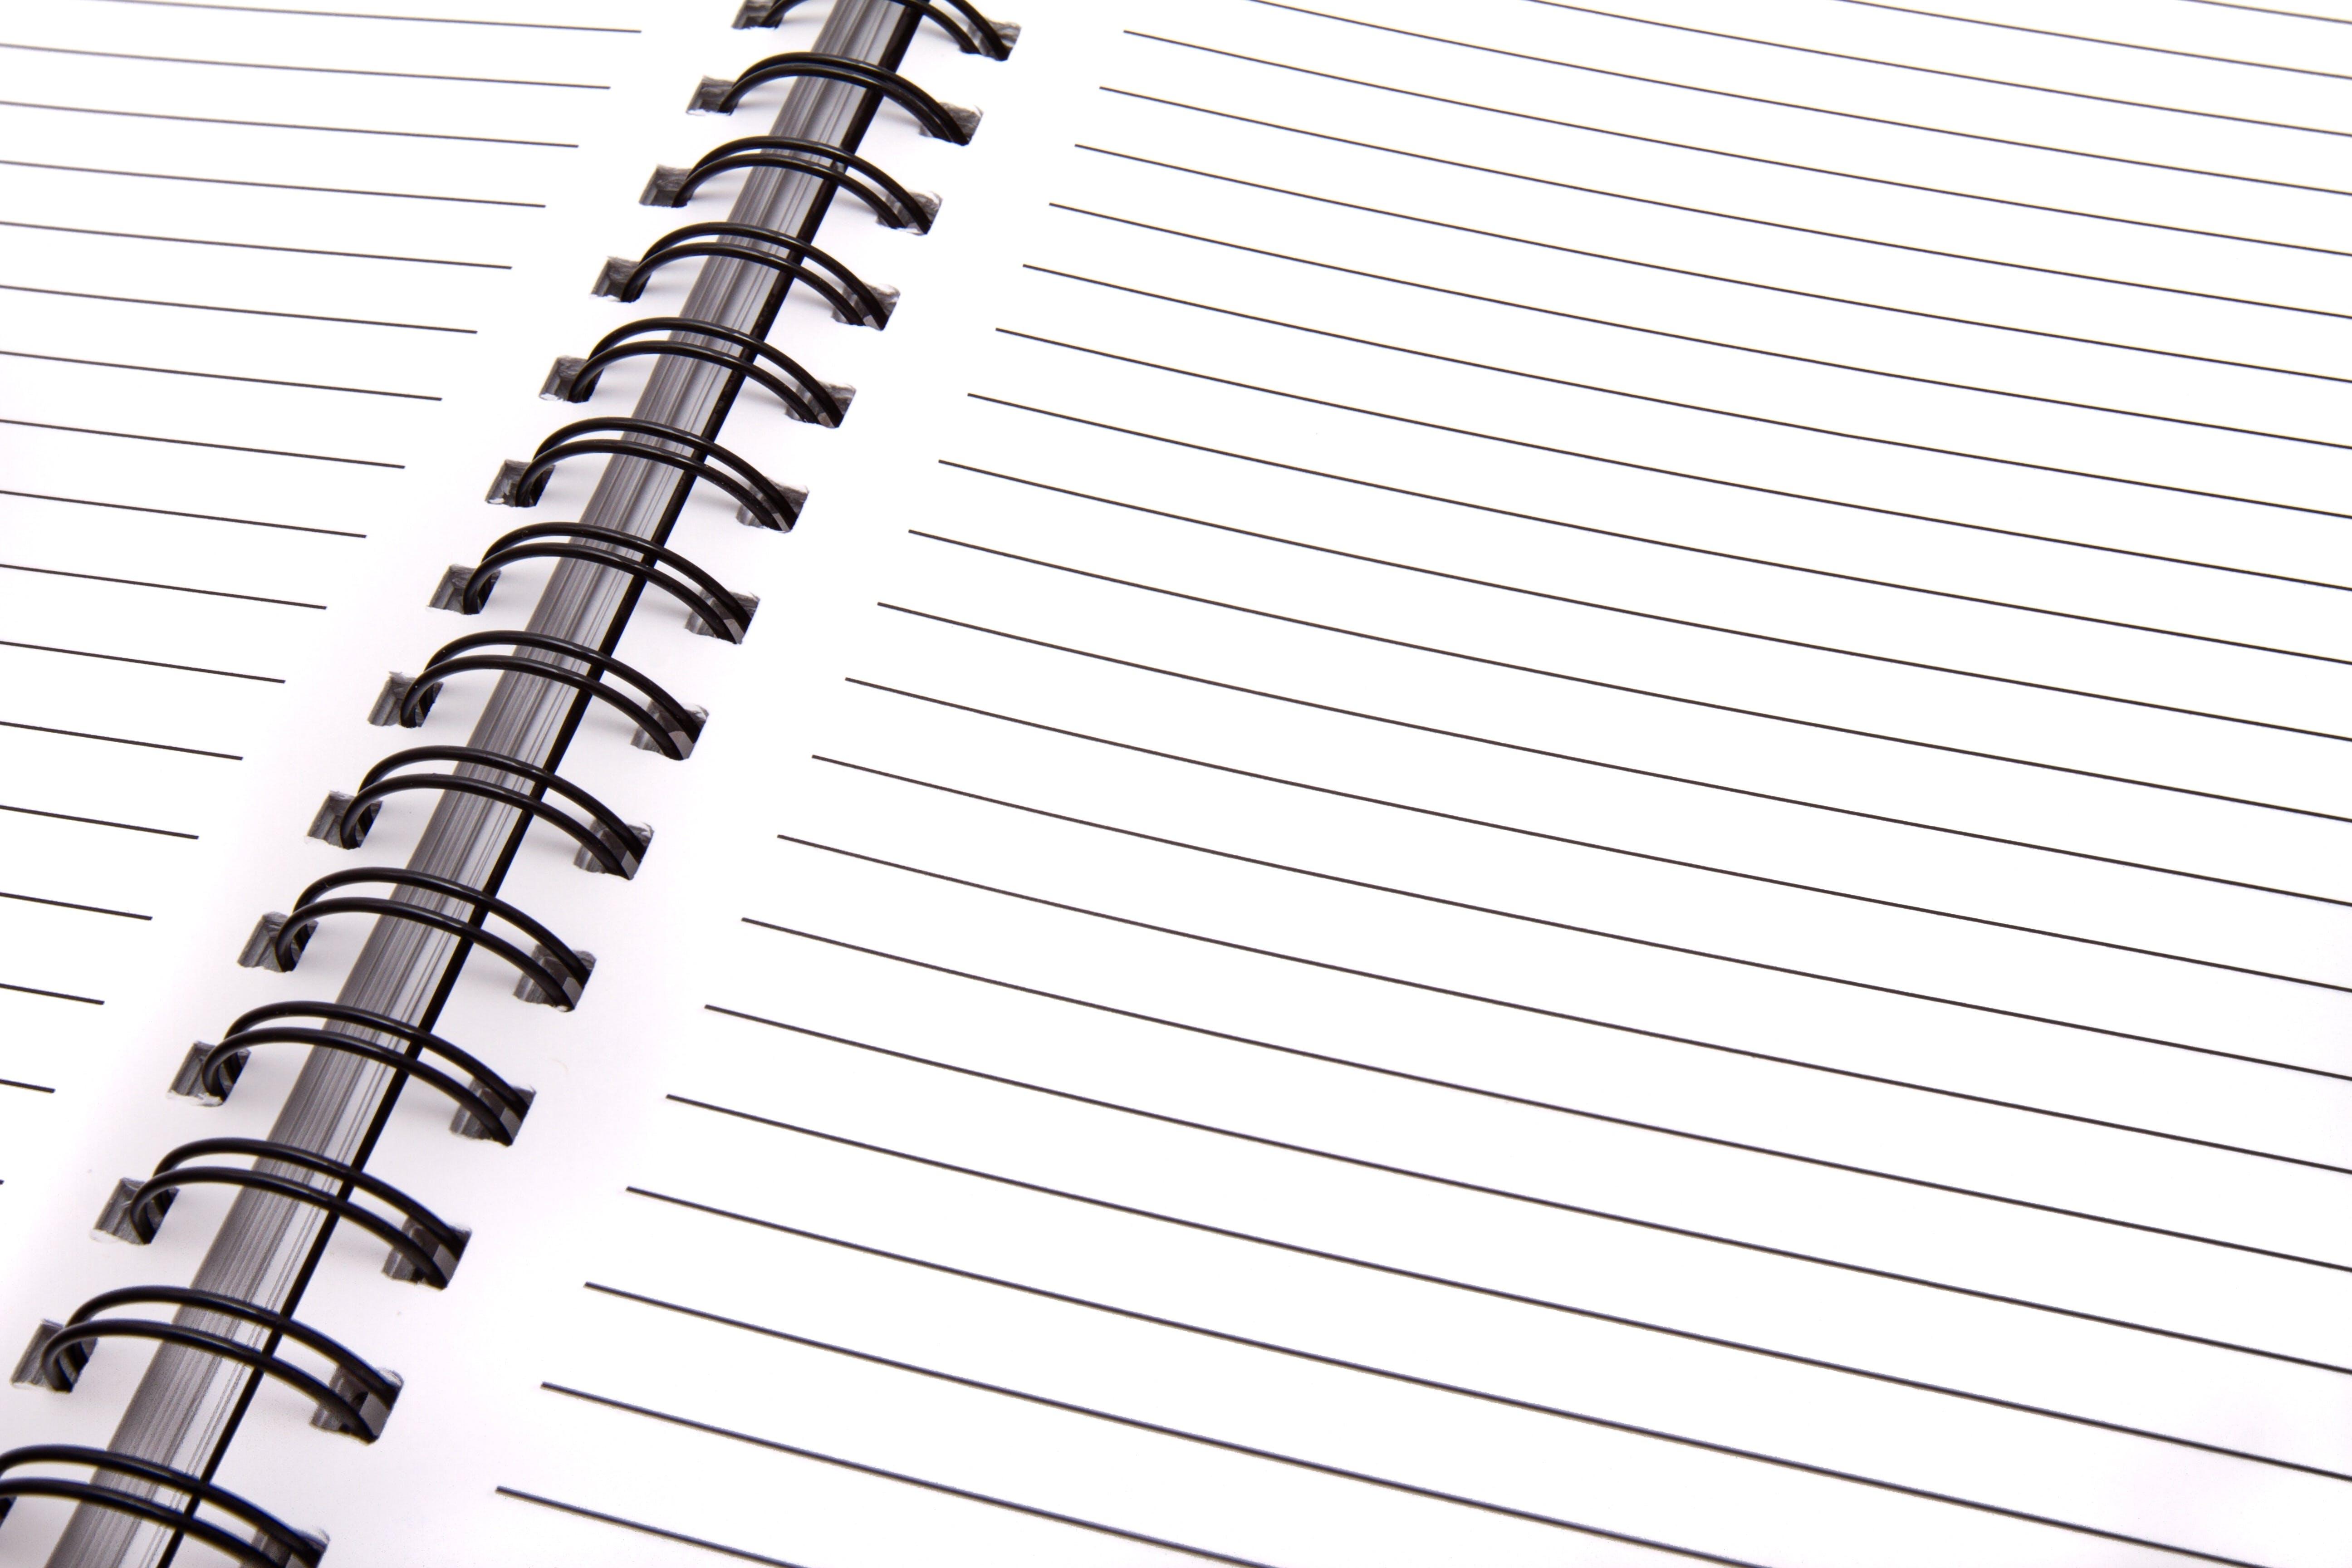 blok, denník, dokument